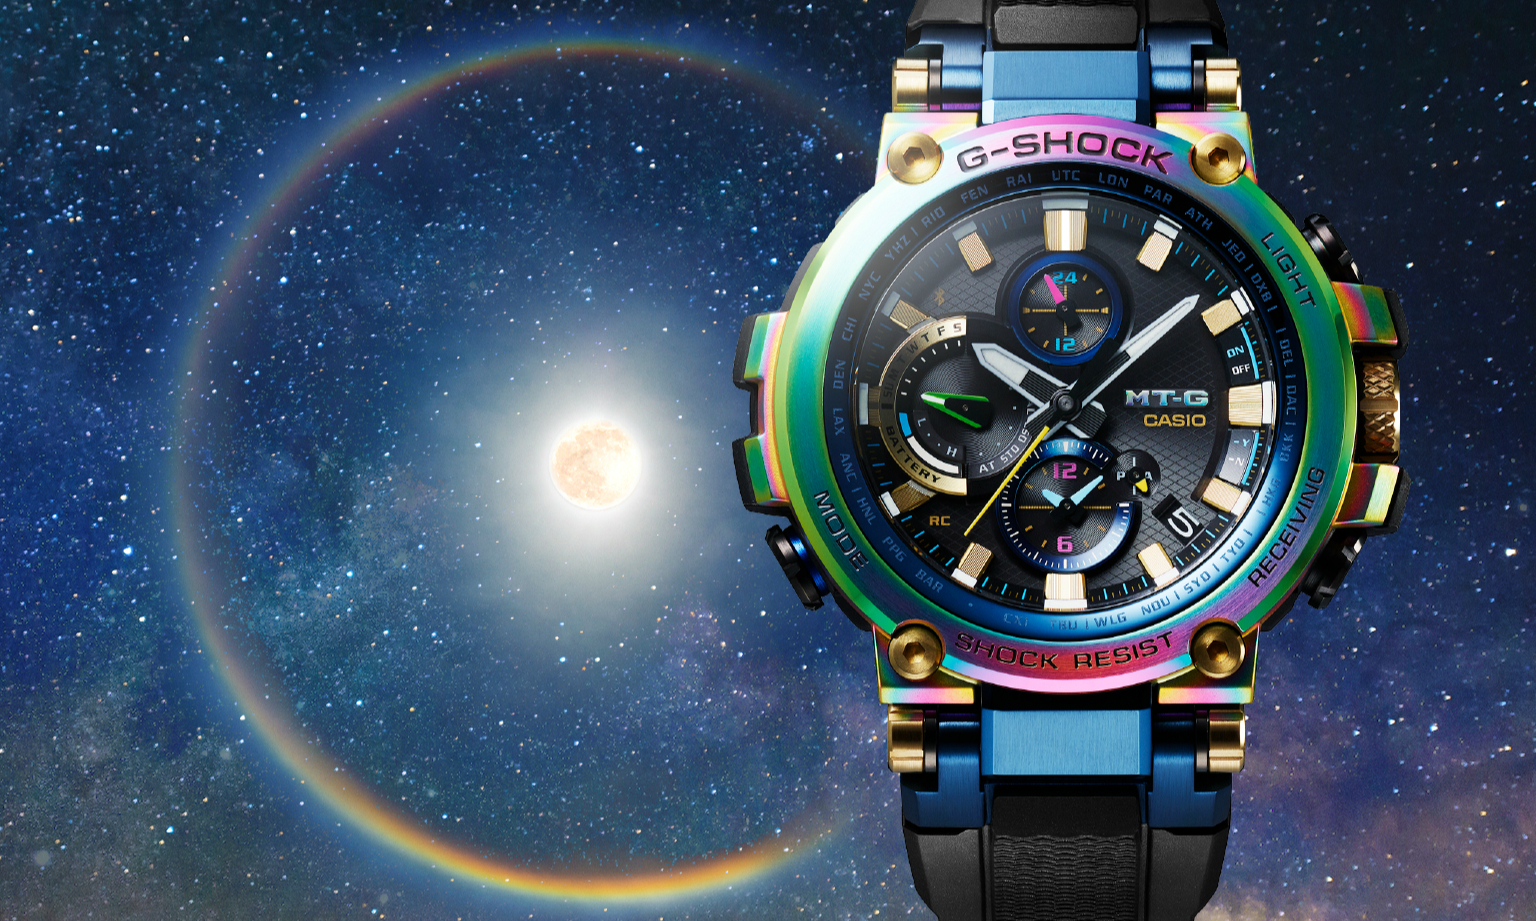 Casio 推出 20 周年纪念彩虹色版本 G-SHOCK MT-G 表款